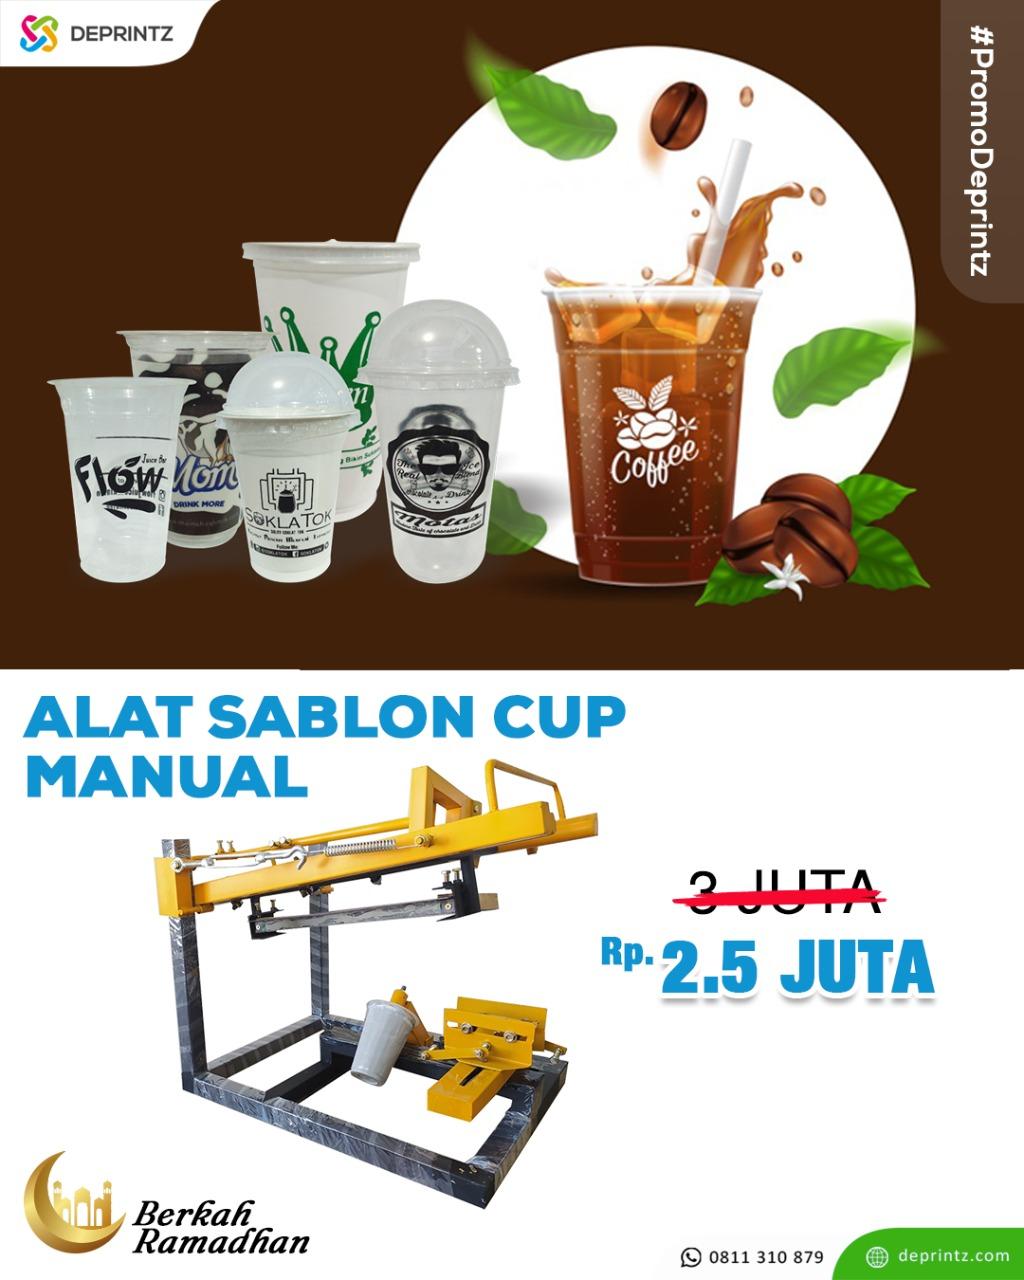 promo sablon cup manual